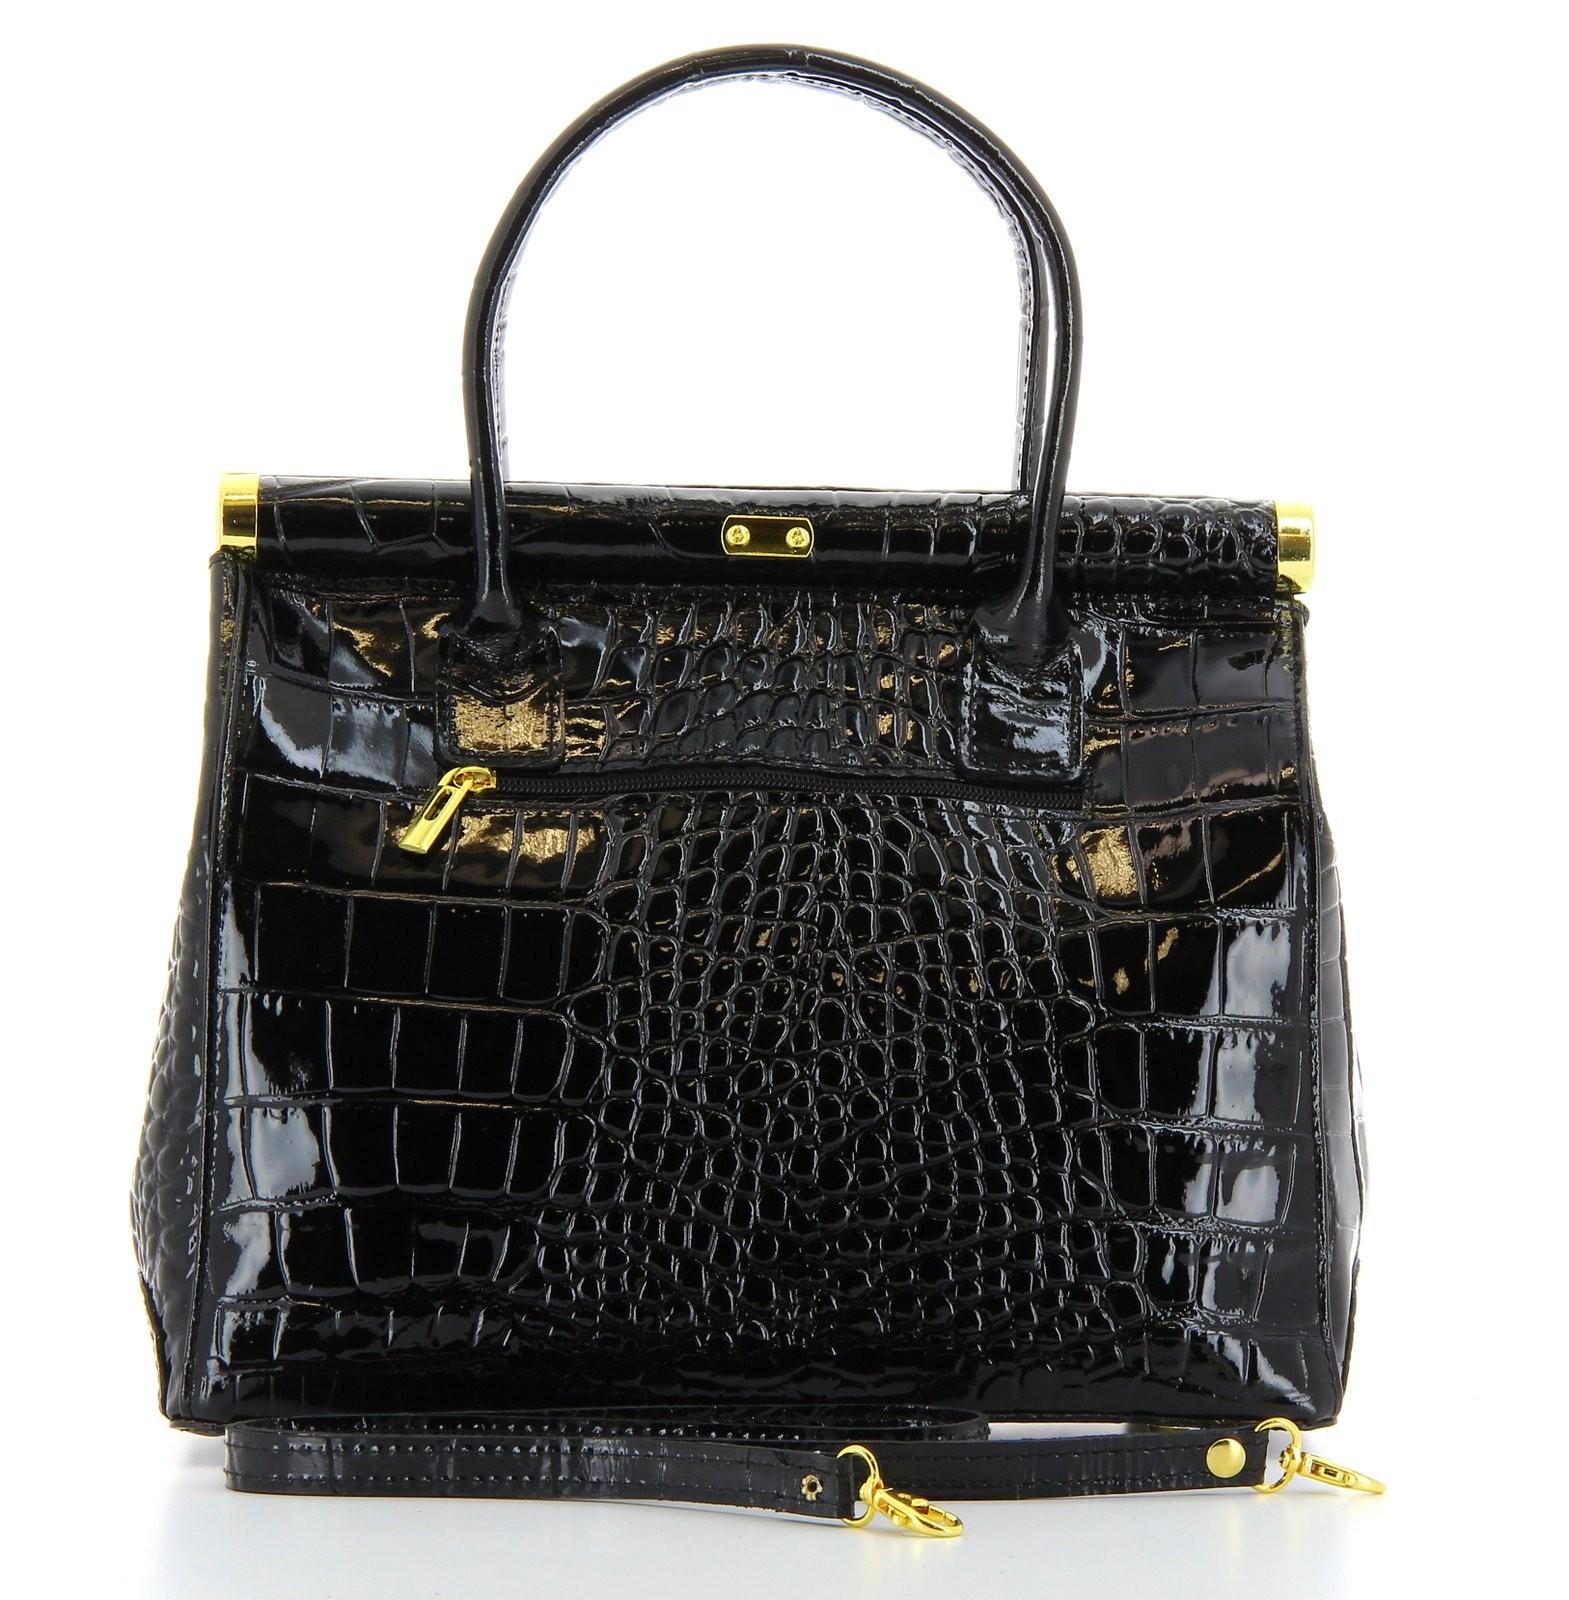 sacs a main femmes luxe achat vente sac de luxe sac a main femme marque sac bandouliere homme elegan. Black Bedroom Furniture Sets. Home Design Ideas